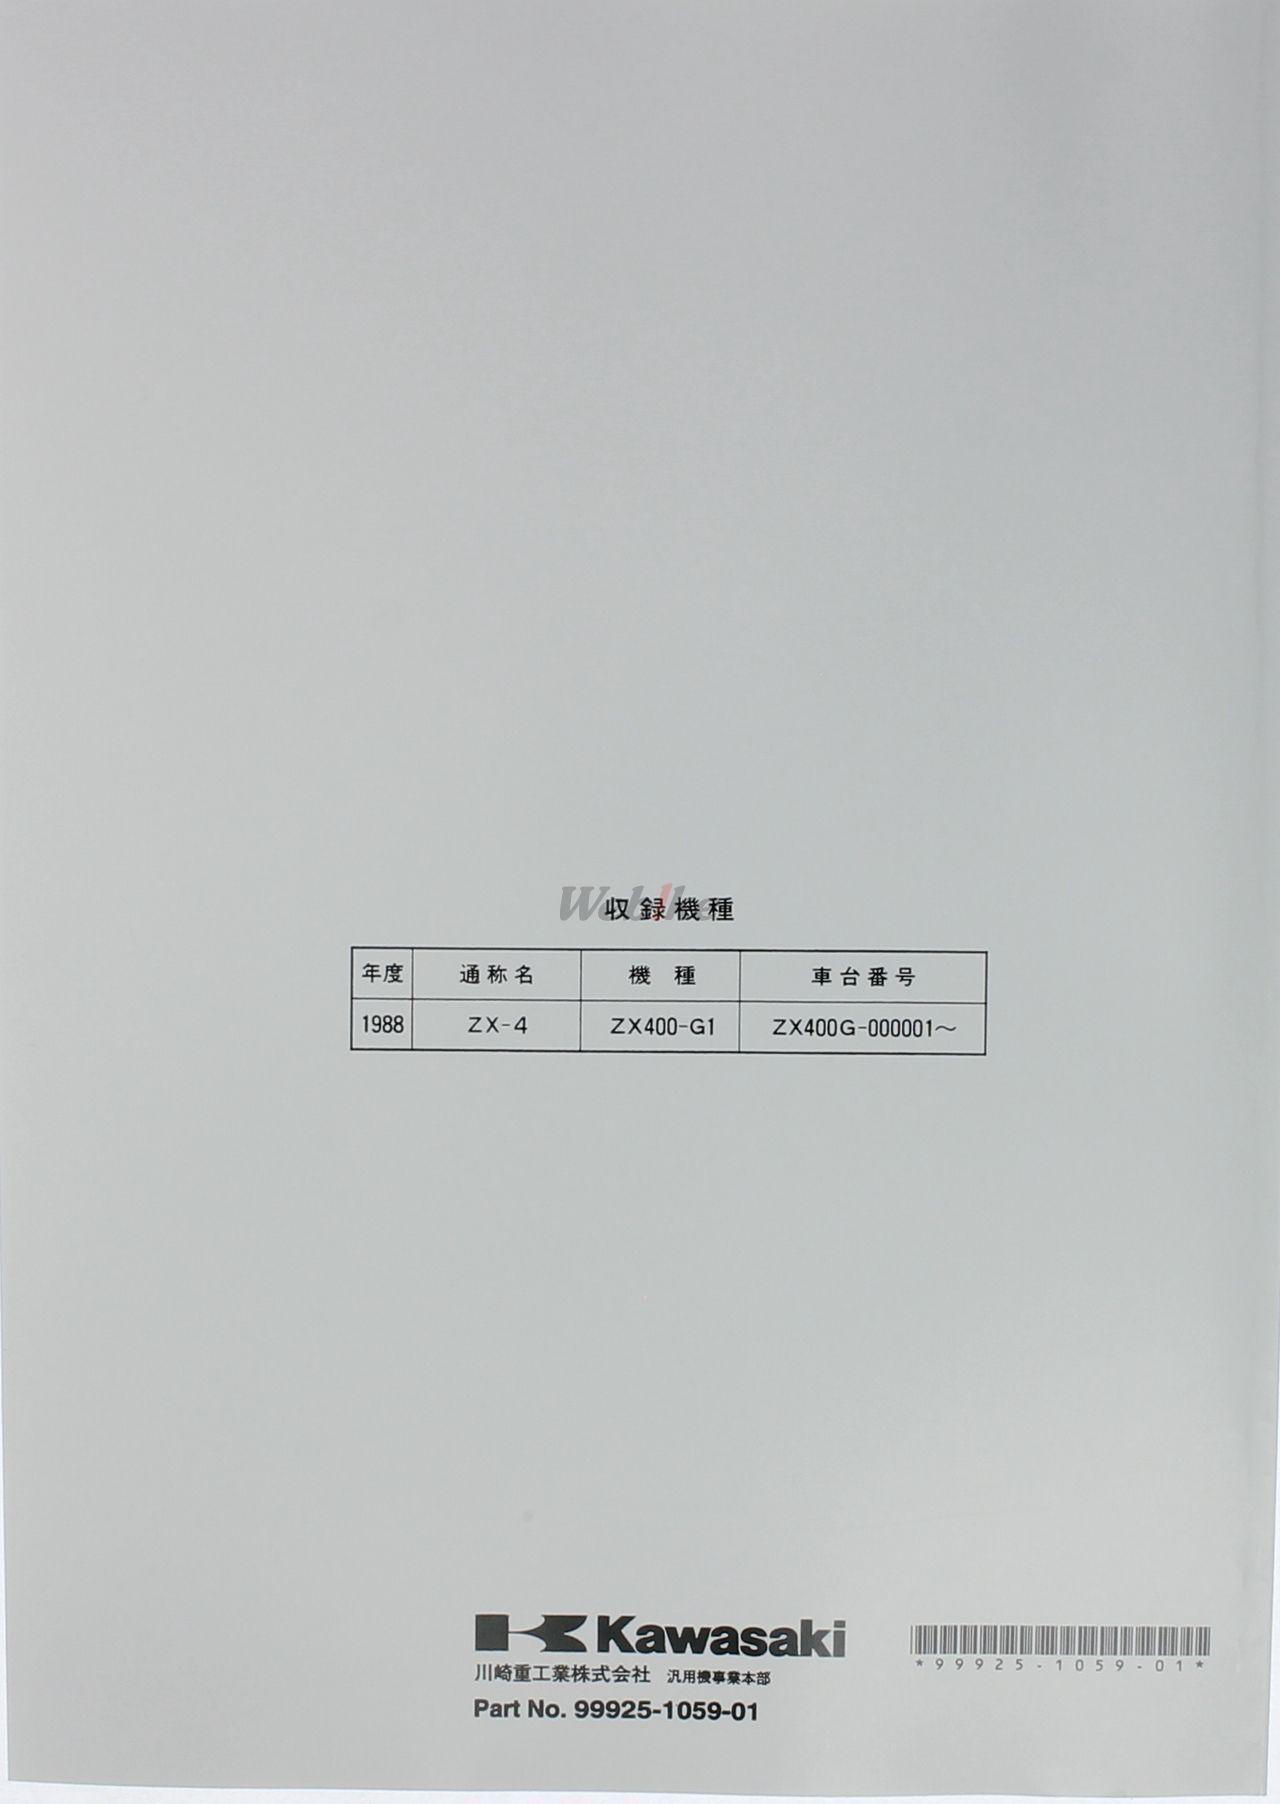 【KAWASAKI】ZX-4/ZXR400 維修手冊(基本版) - 「Webike-摩托百貨」